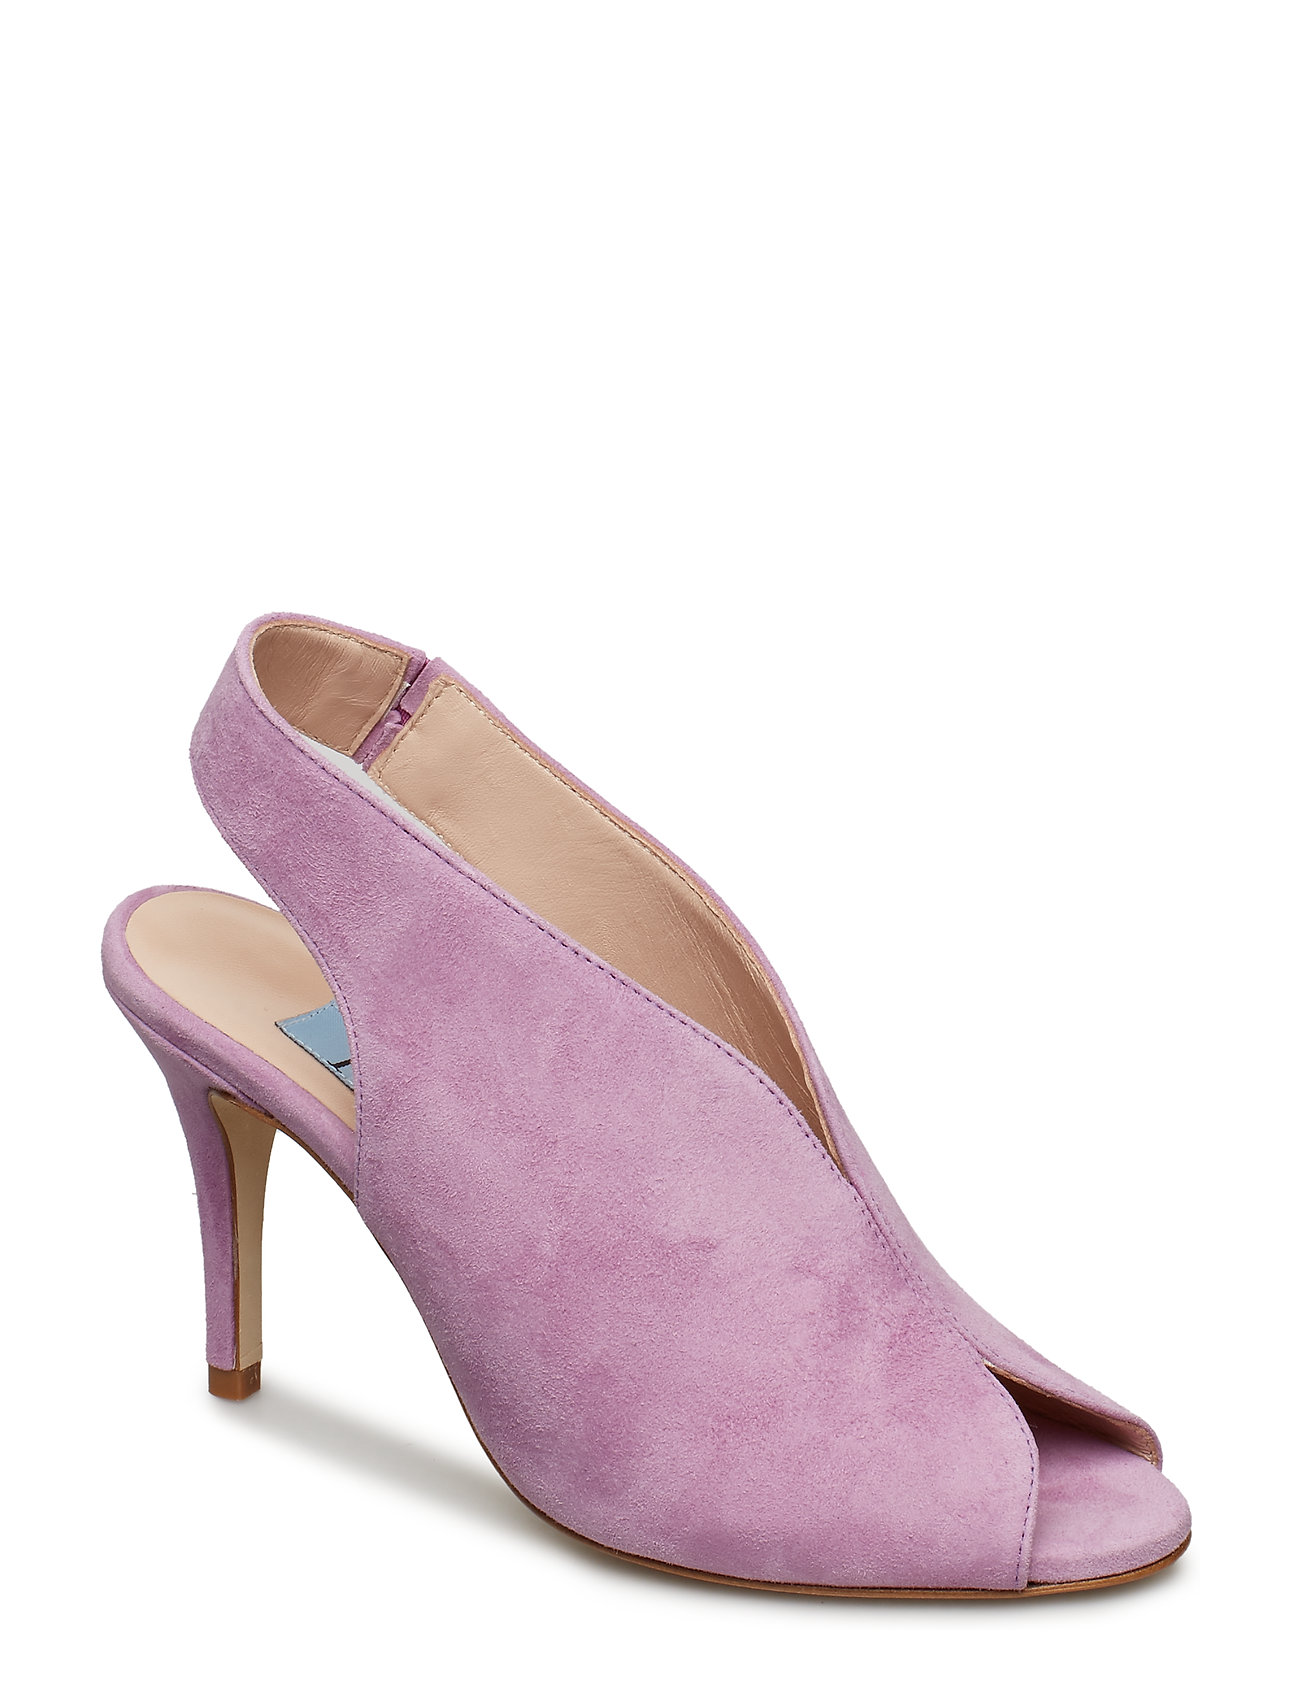 Apair Slingback open toe stiletto - MATRIX